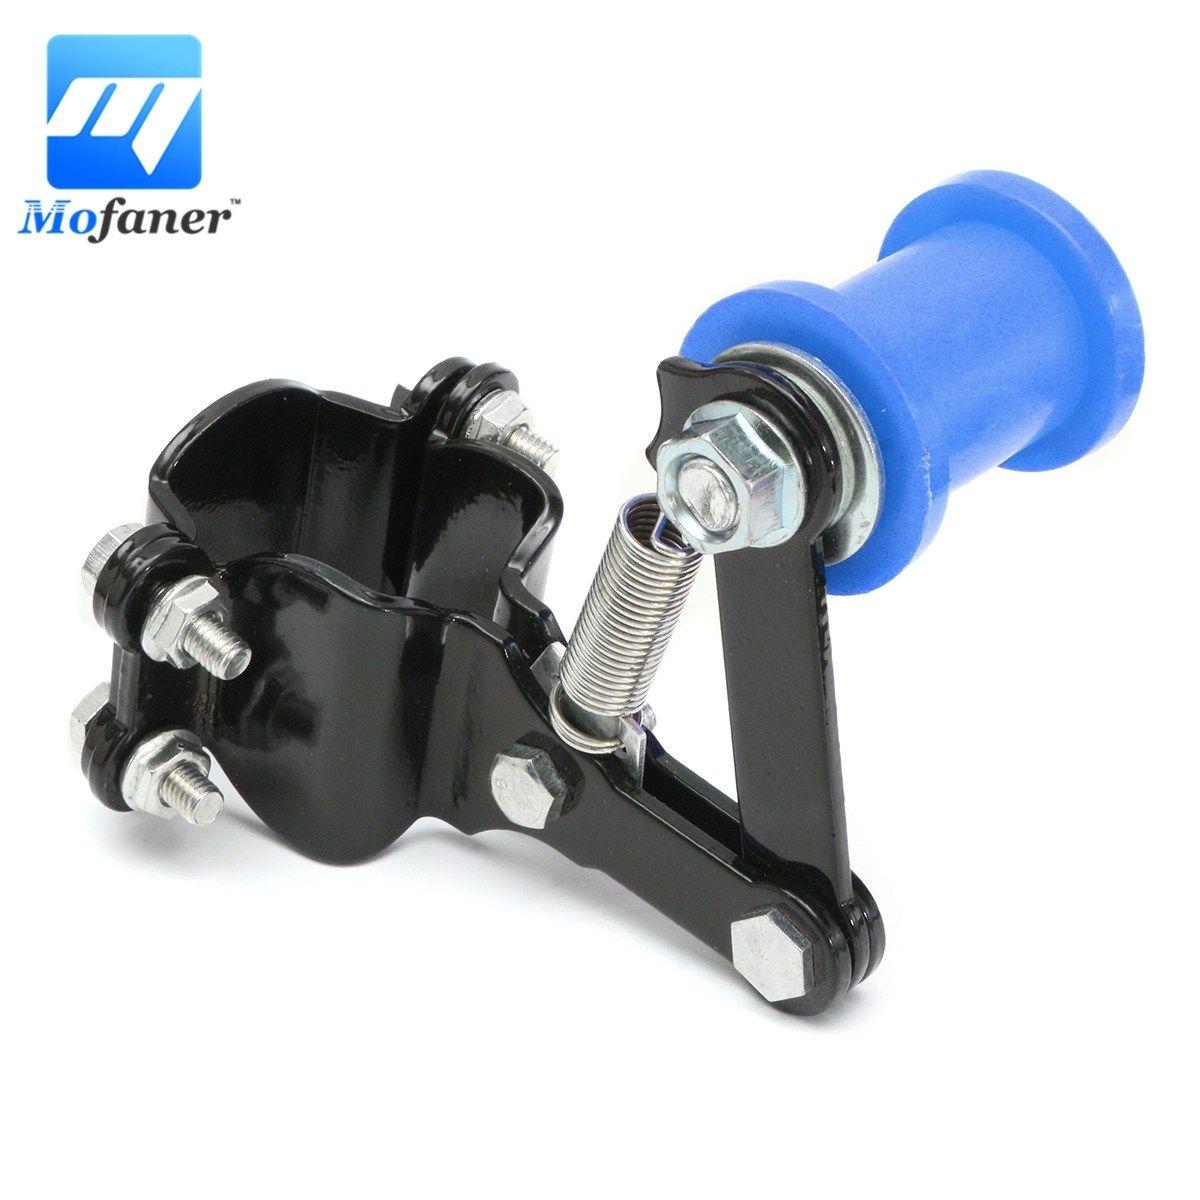 Roller Wheel Chain Tensioner Adjuster For Harley/Honda/Suzuki/Chopper Motocross Refit Racing Modified